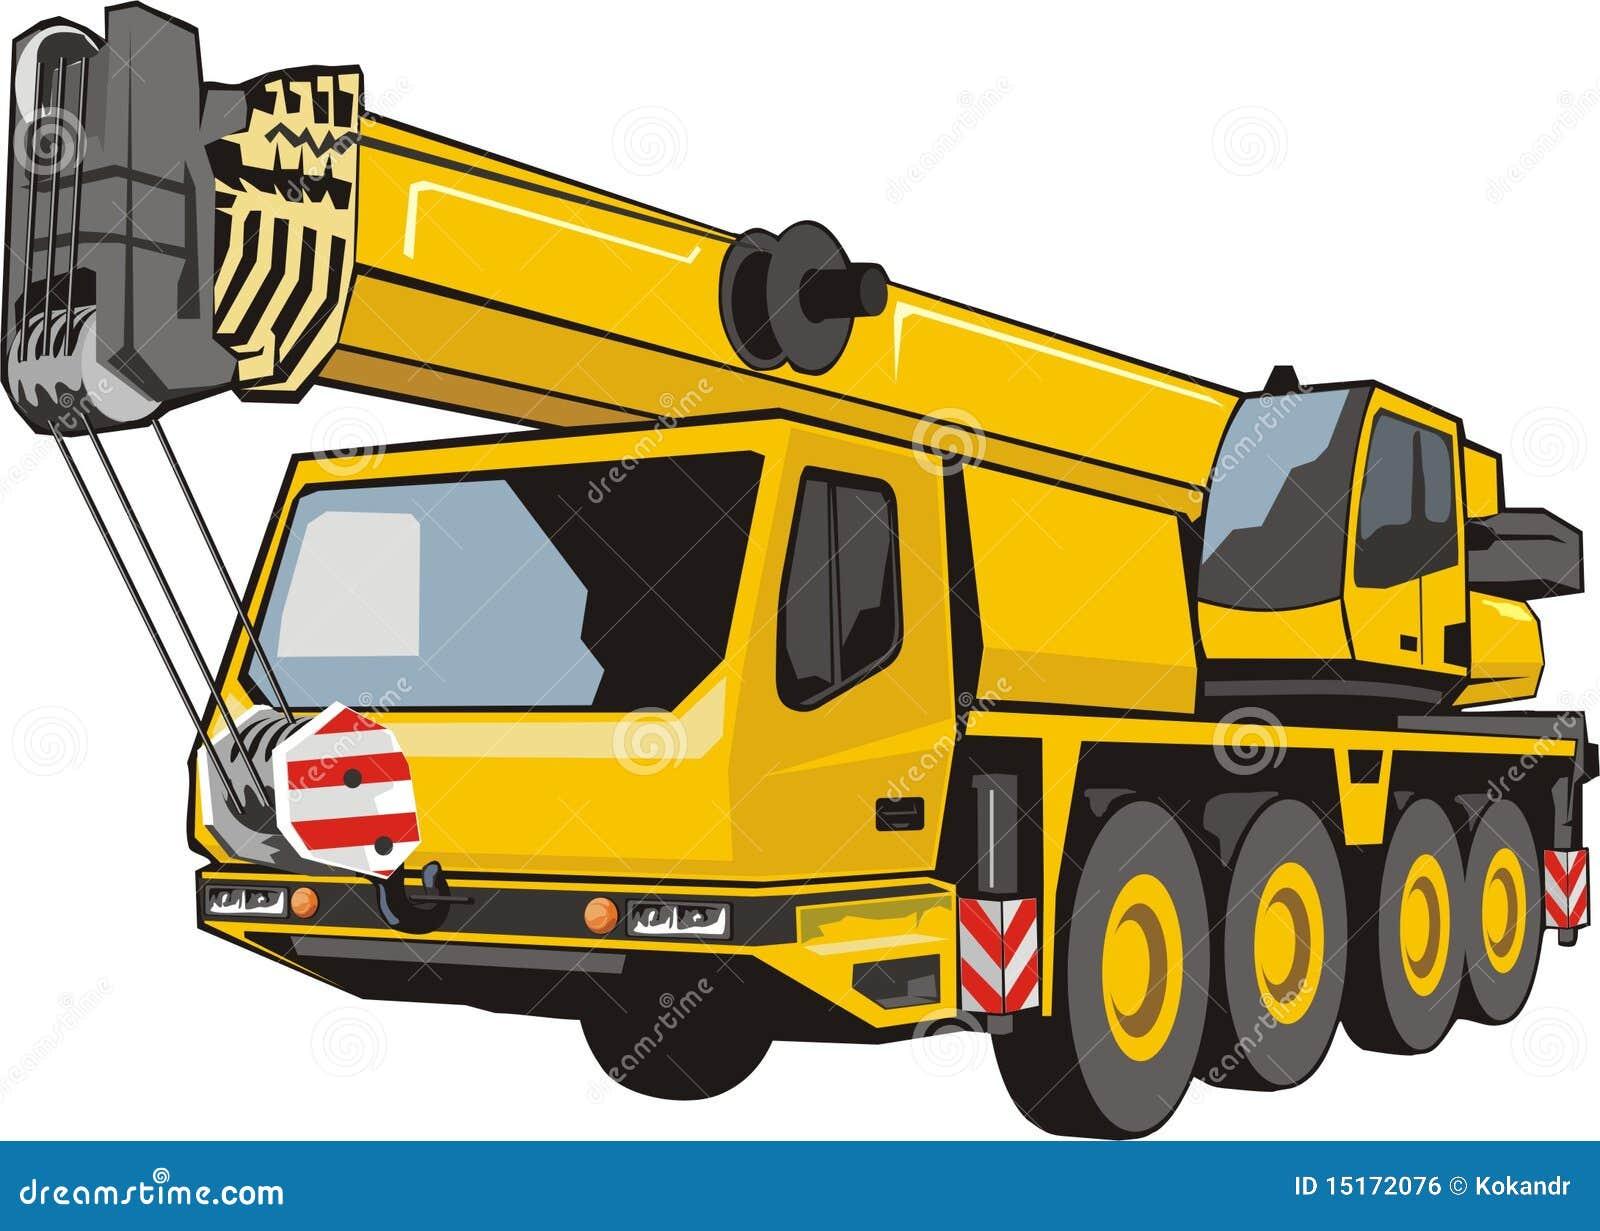 Heavy Mobile Crane Stock Vector Illustration Of Vessel